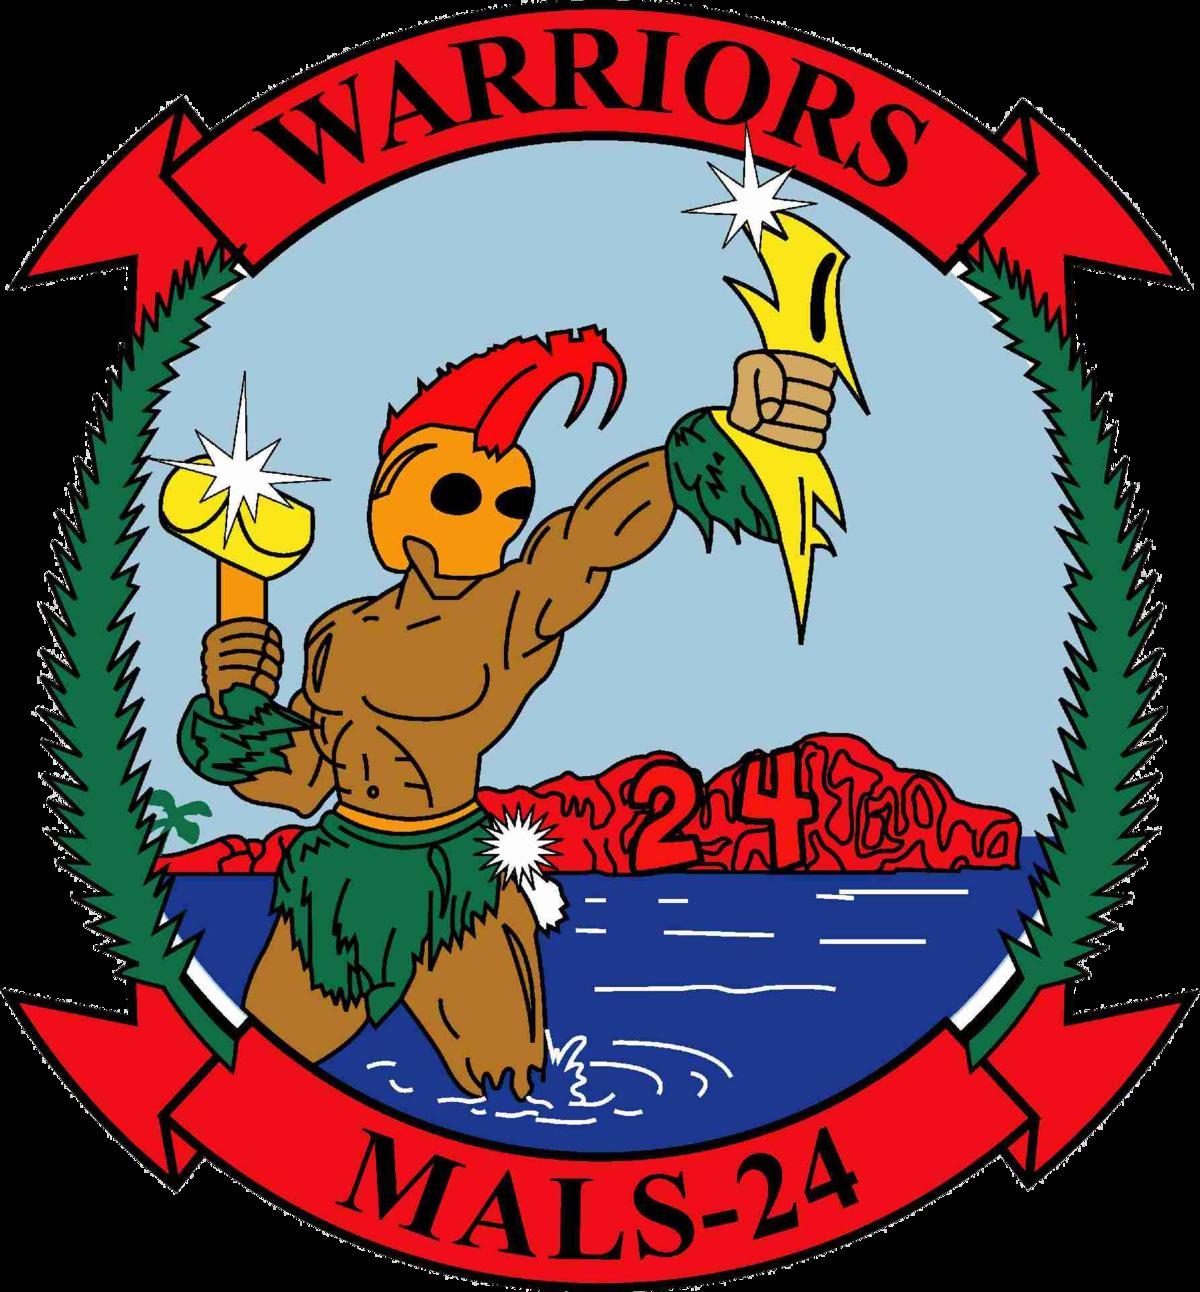 Marine Aviation Logistics Squadron 24 - Wikipedia